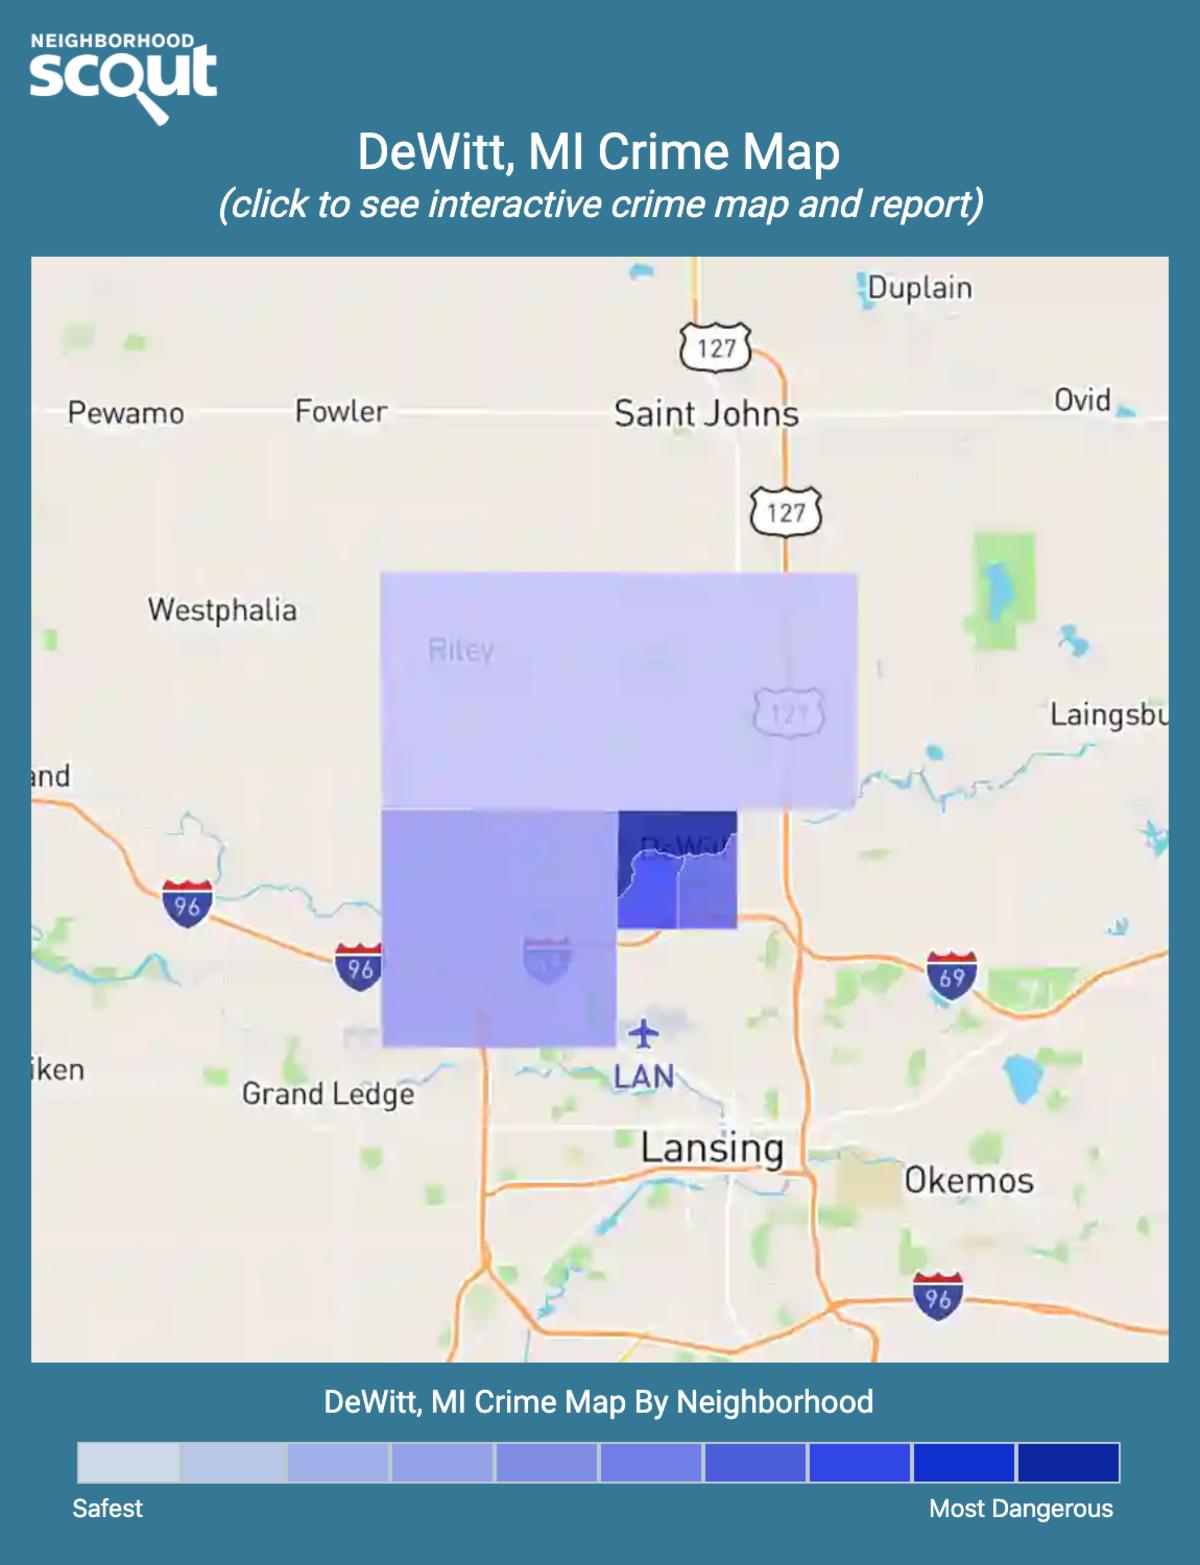 DeWitt, Michigan crime map